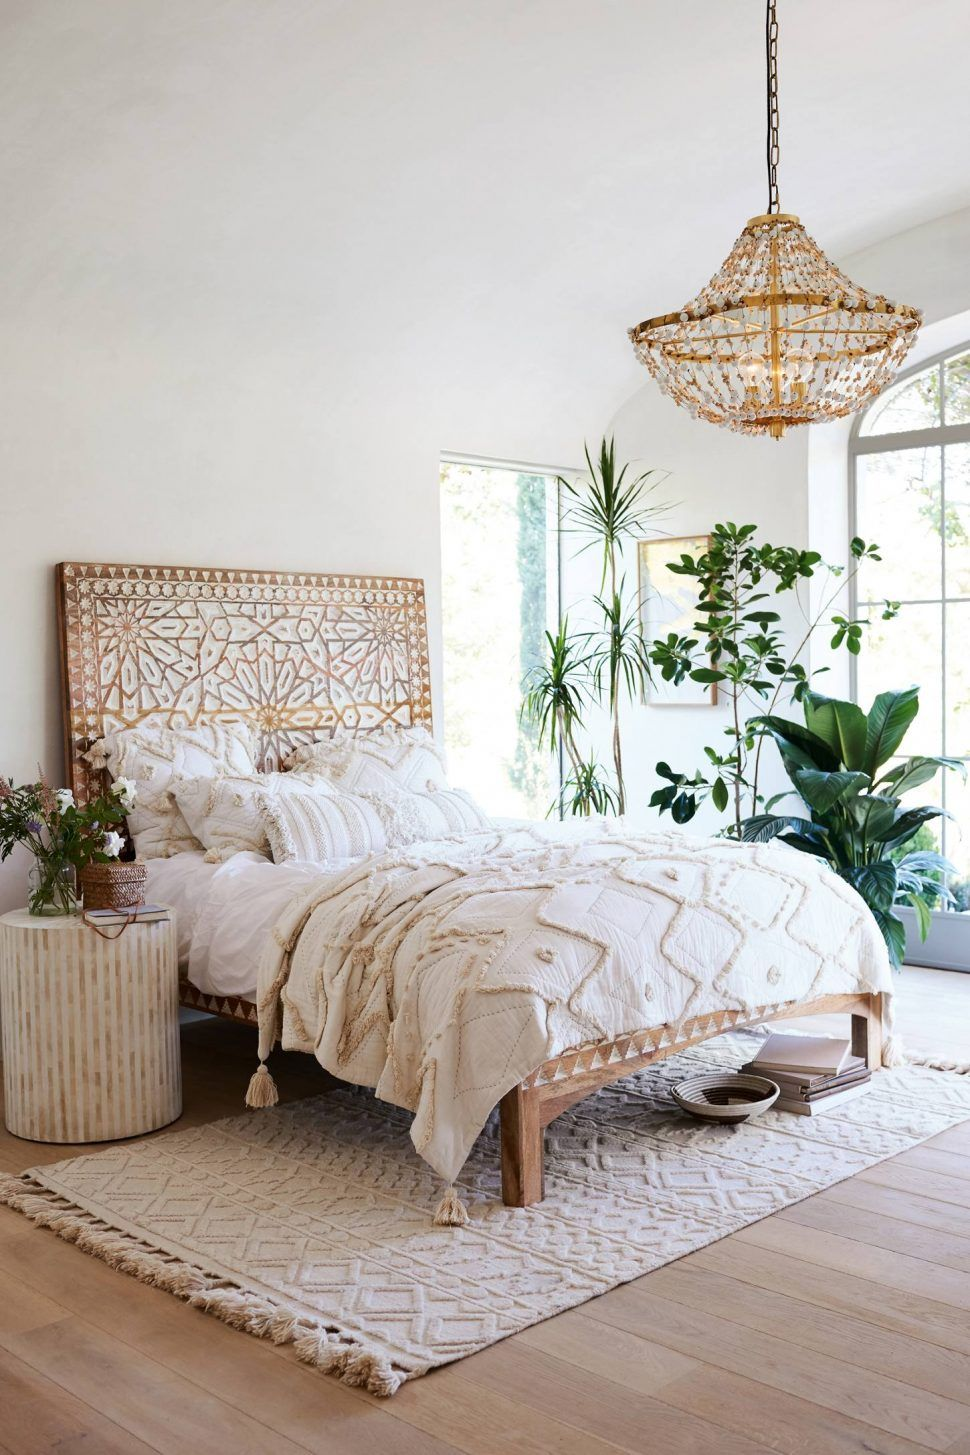 Bedroom Boho House Decor Vintage Bohemian Furniture Bohemian Bed